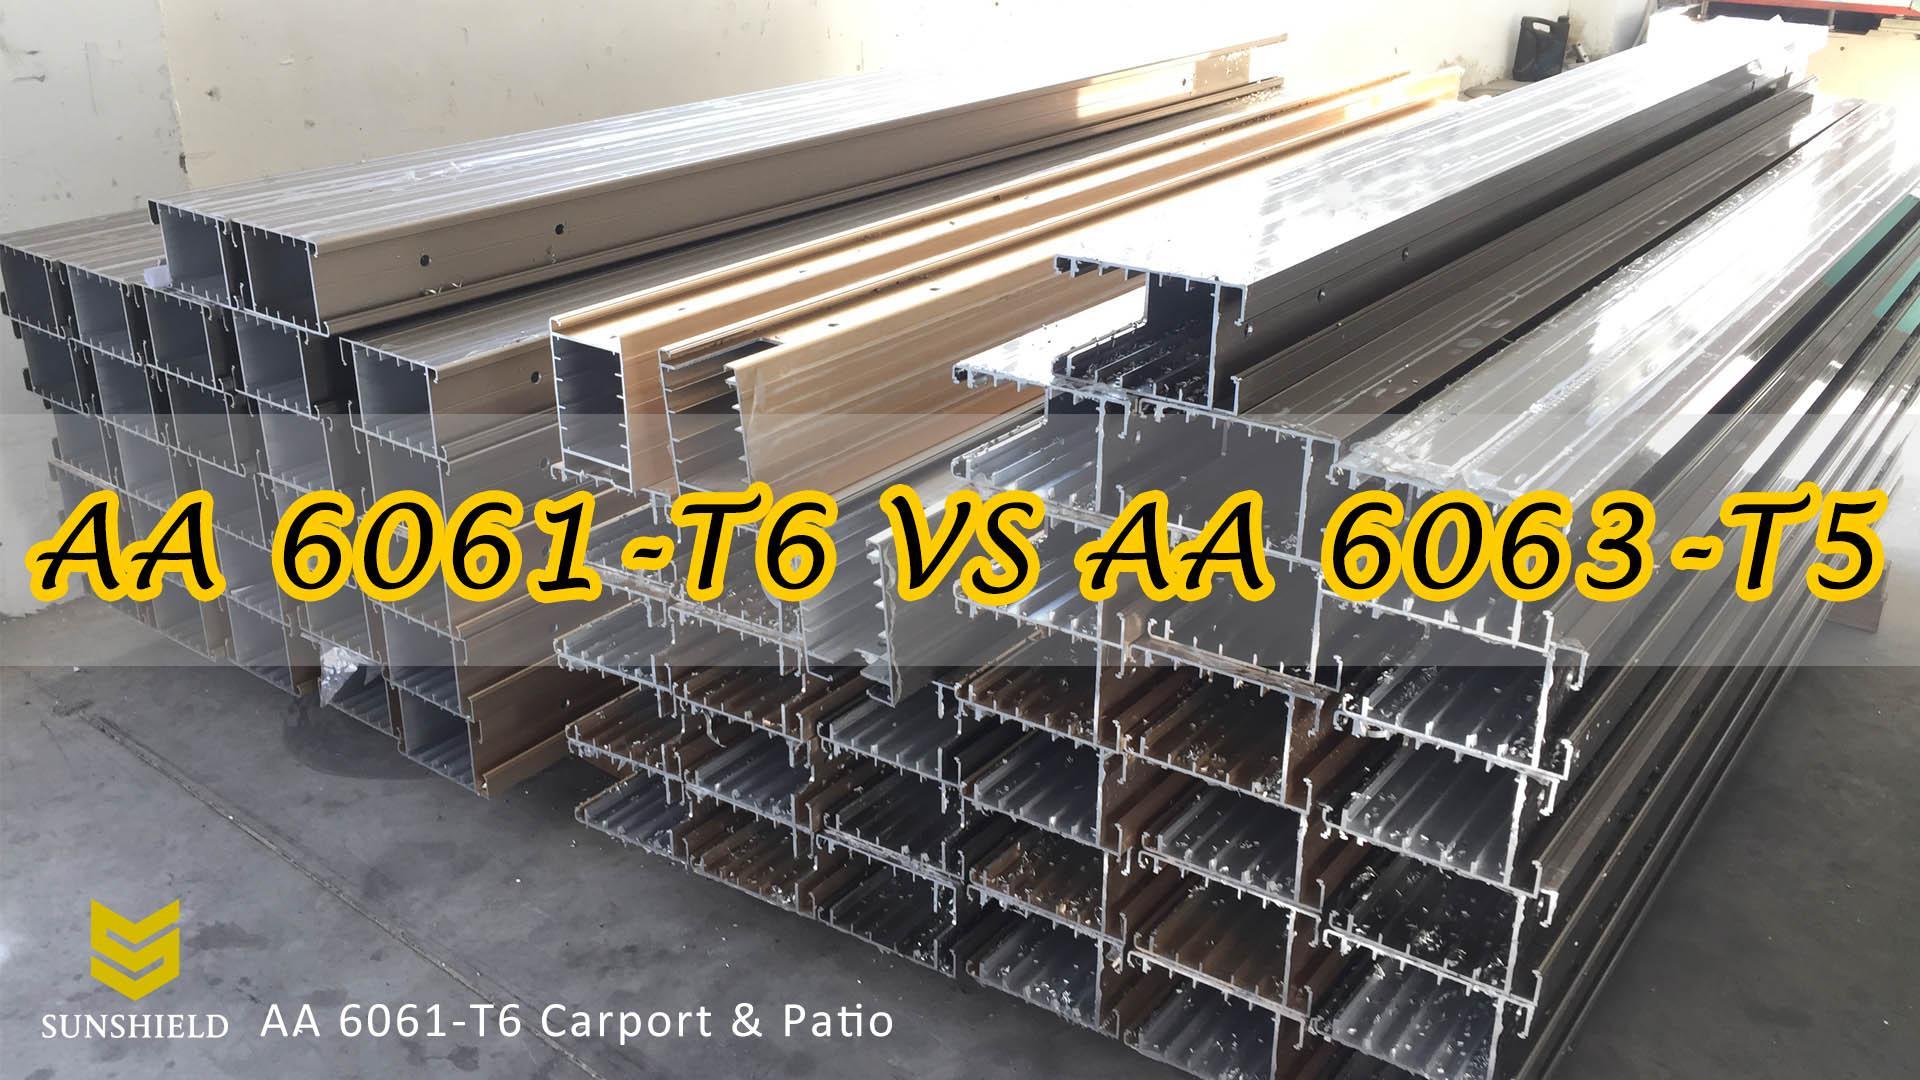 AA 6061-T6 VS AA 6063-T5 - Aluminum Alloy Frames - Aluminum Alloy 6061-T6 - Aluminum Alloy 6063-T5-Sunshield Shelter